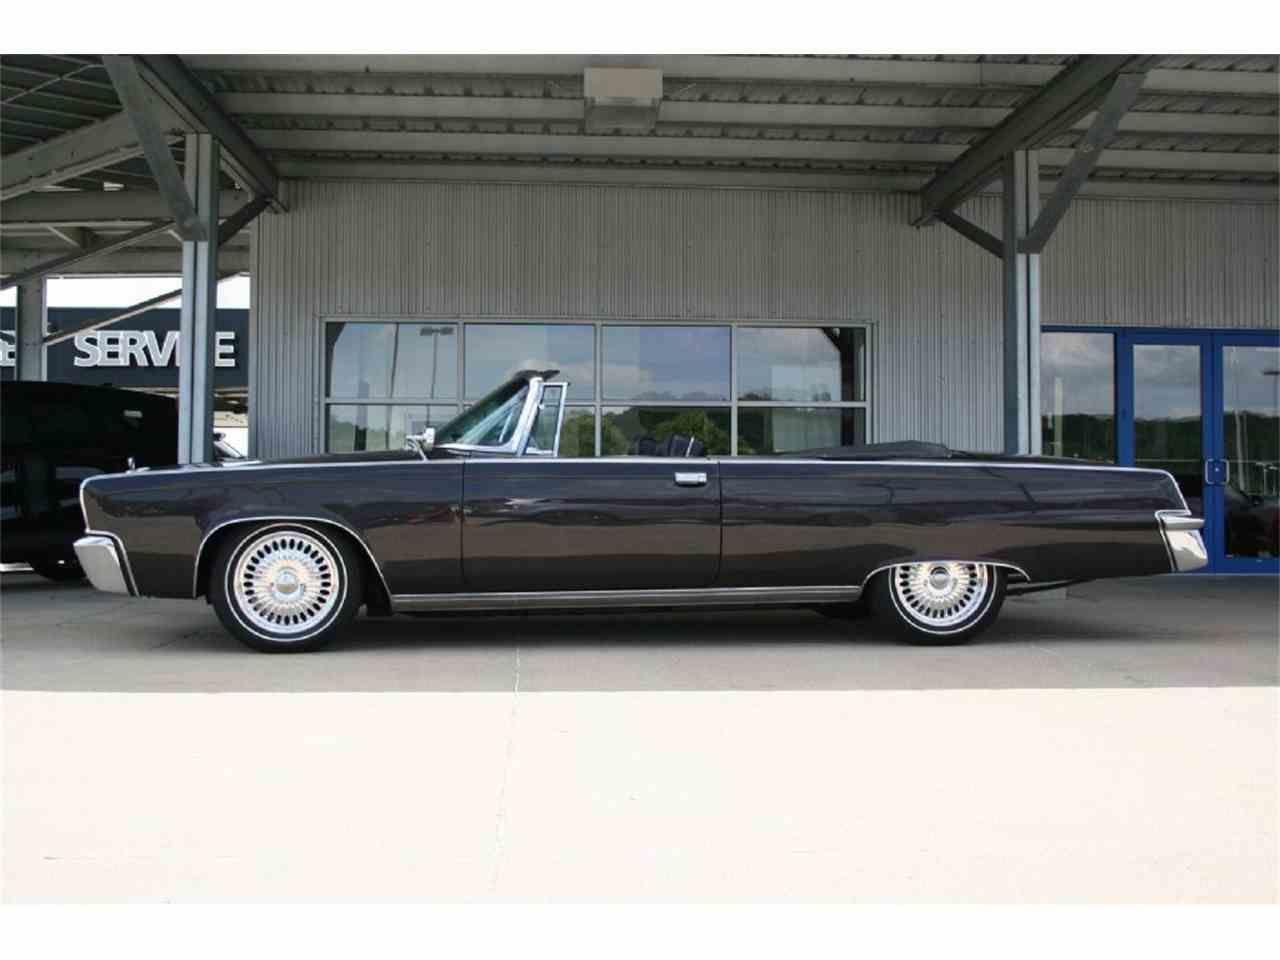 1965 Chrysler Imperial Chrysler Imperial Chrysler Chrysler Cars